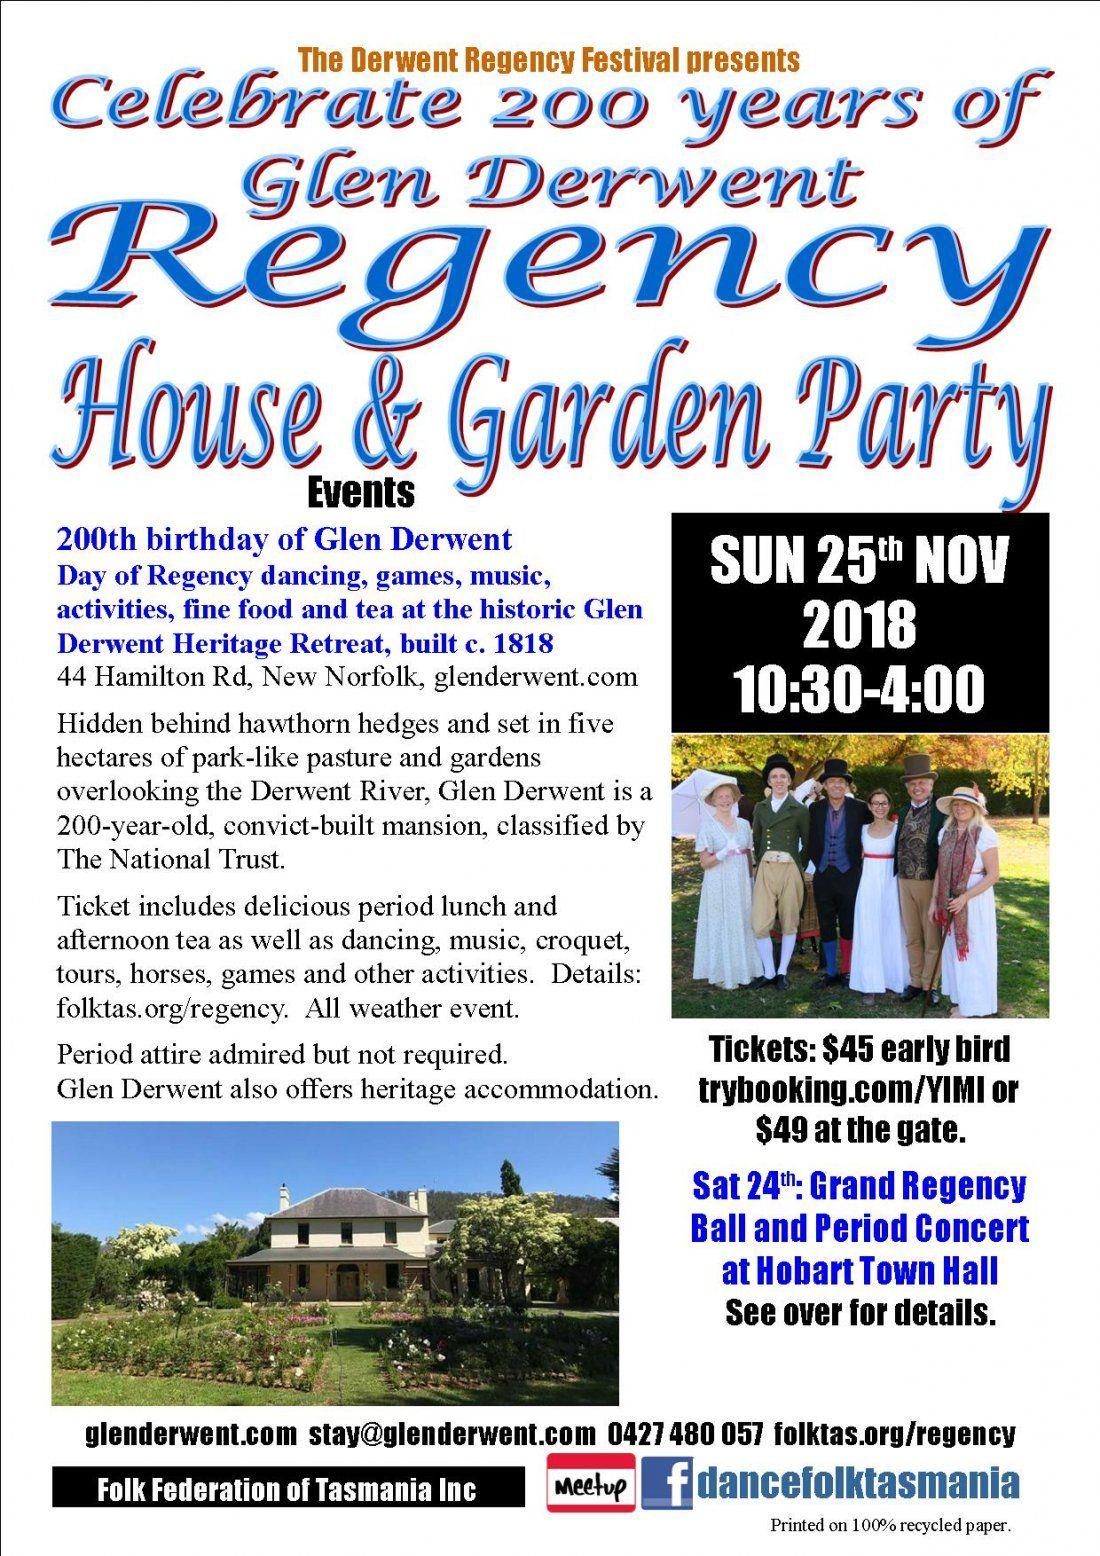 Regency House & Garden Party